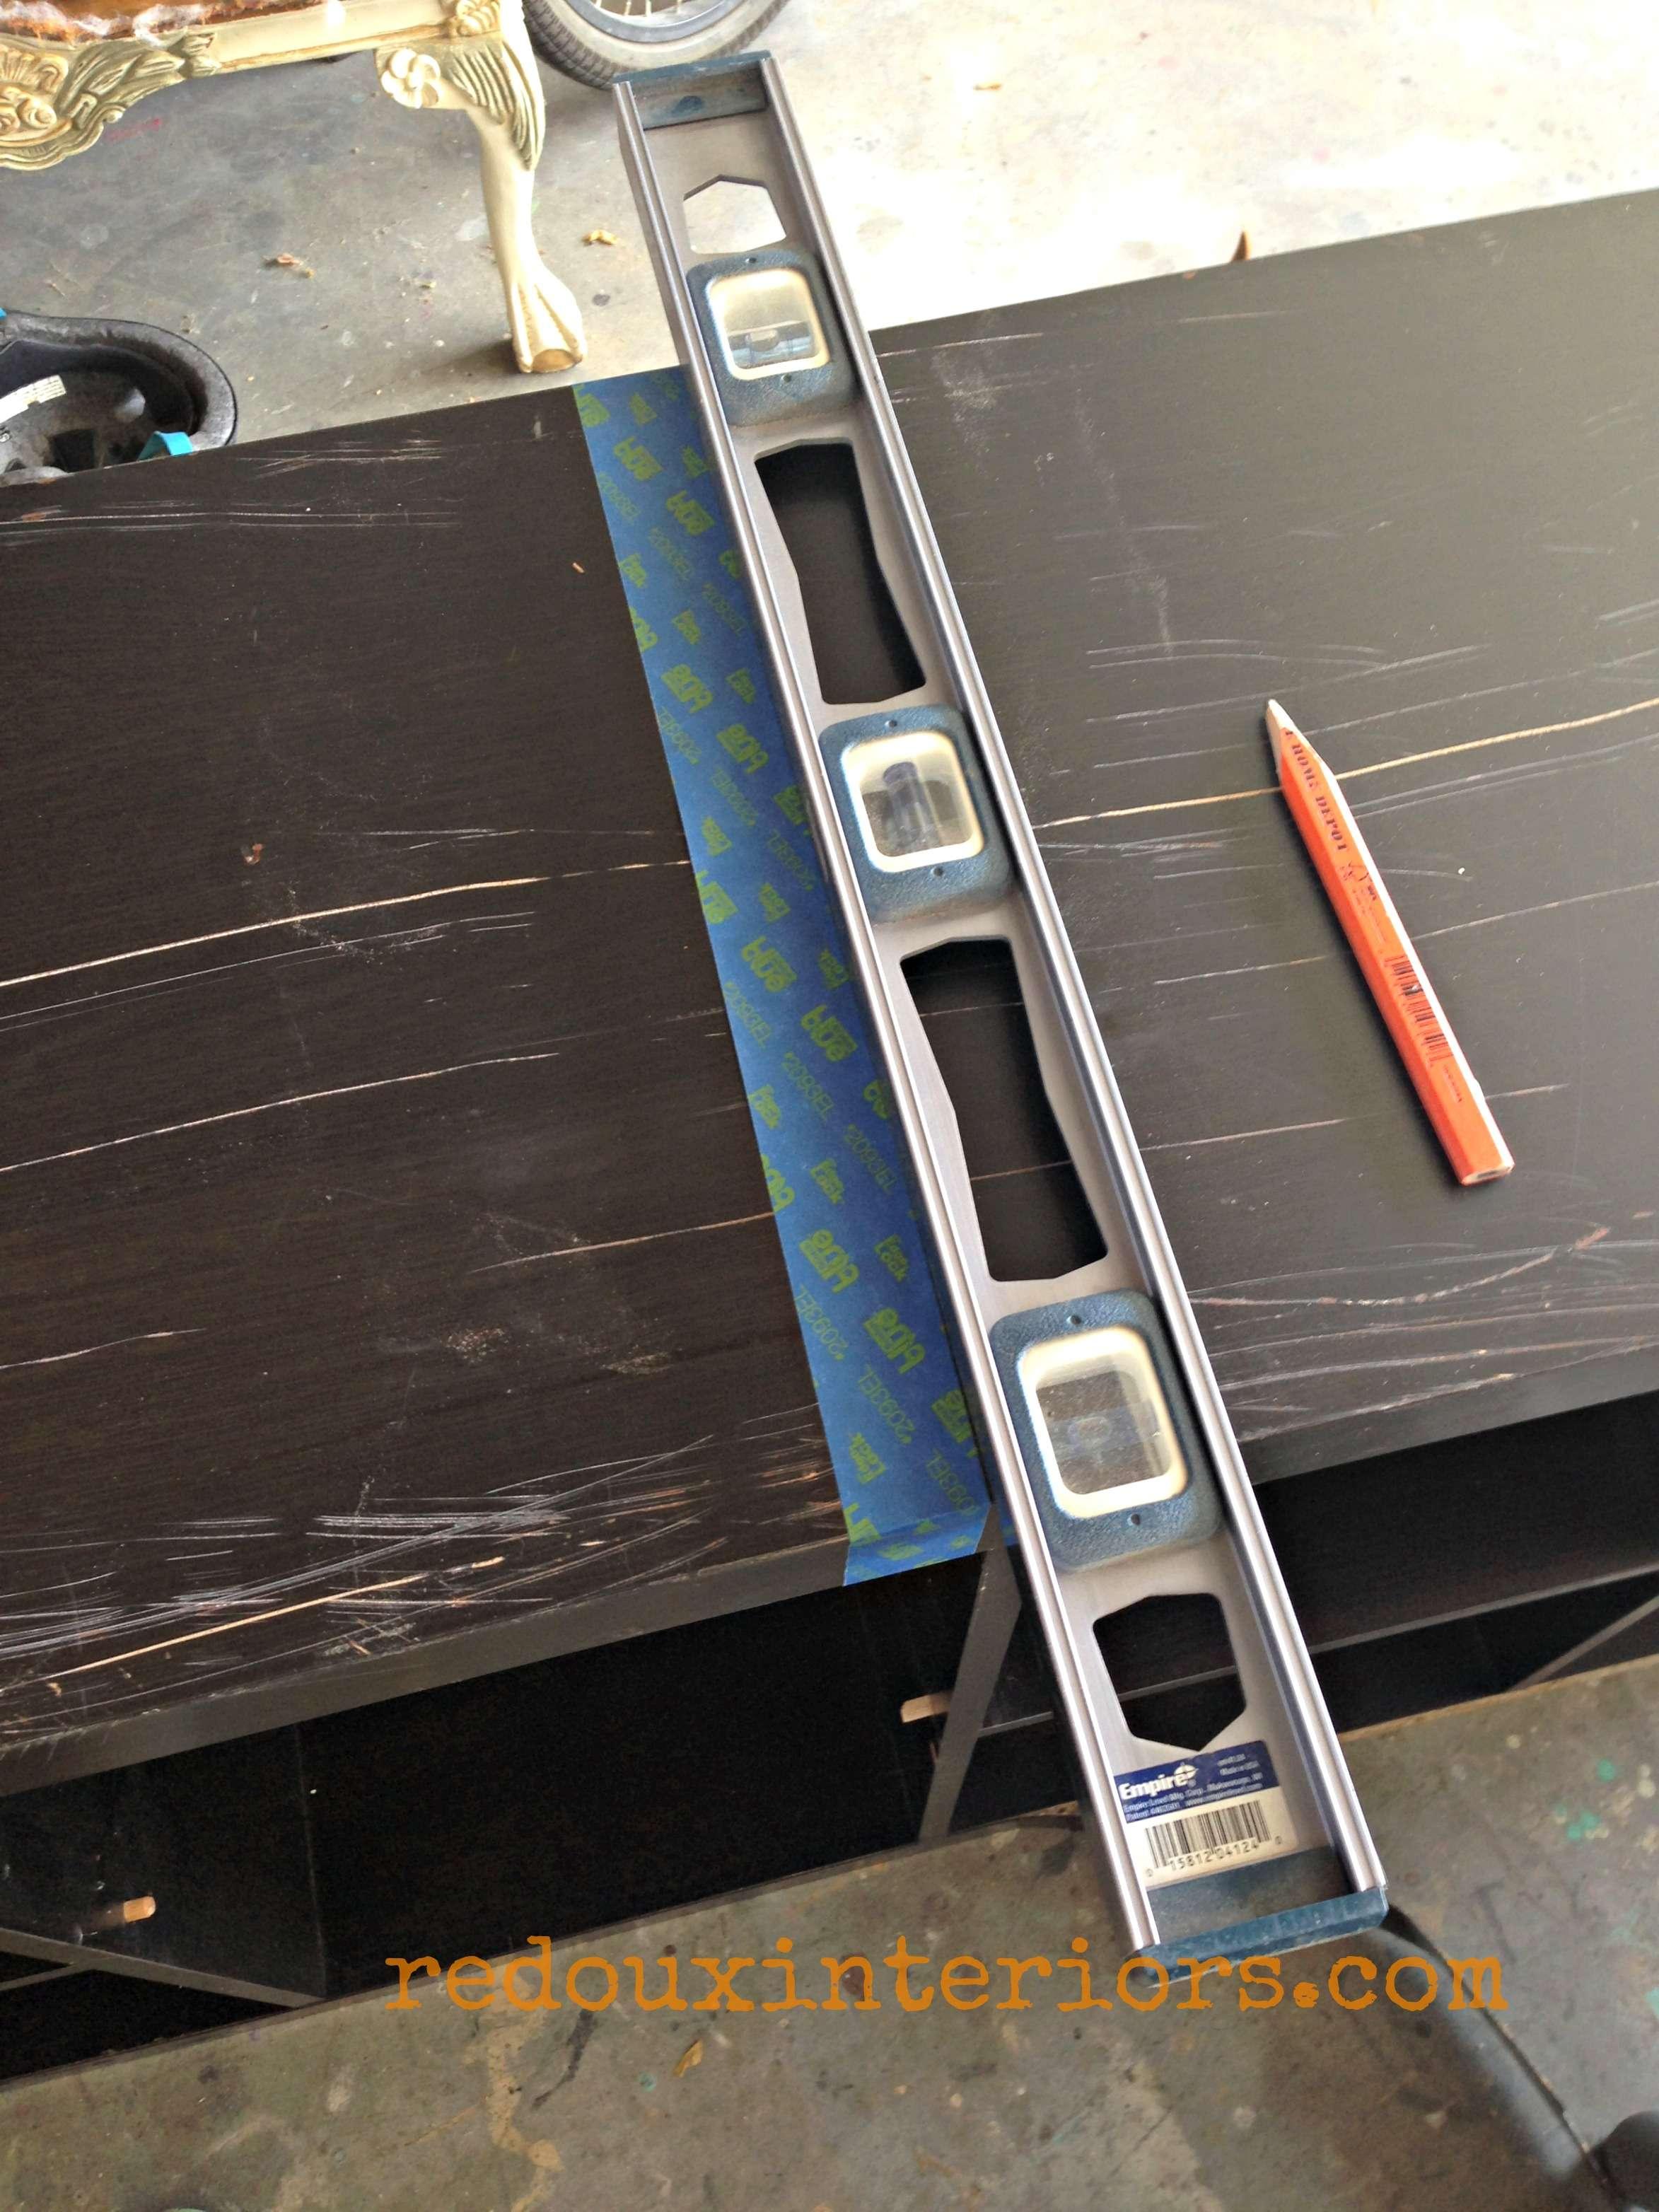 Bookshelf turned cart being measured for cutting redouxinteriors